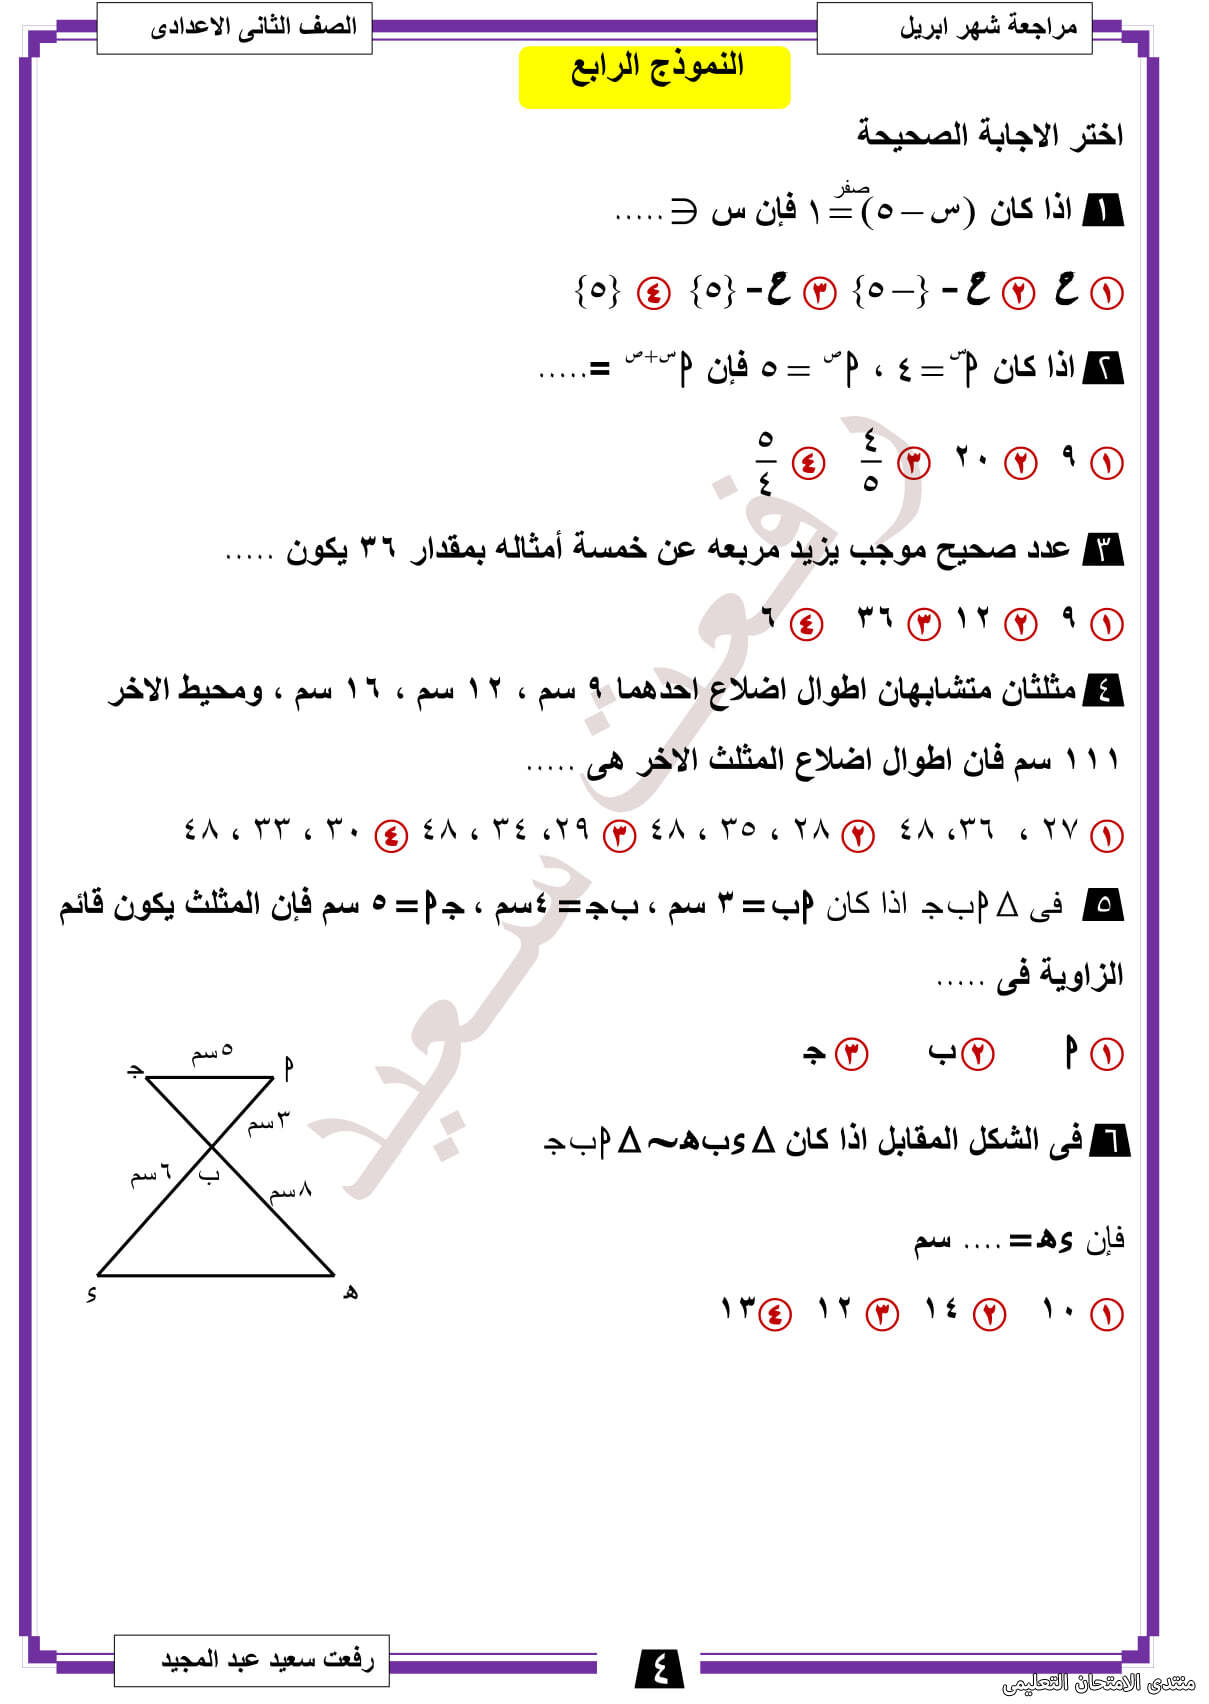 exam-eg.com_161904908761794.jpg